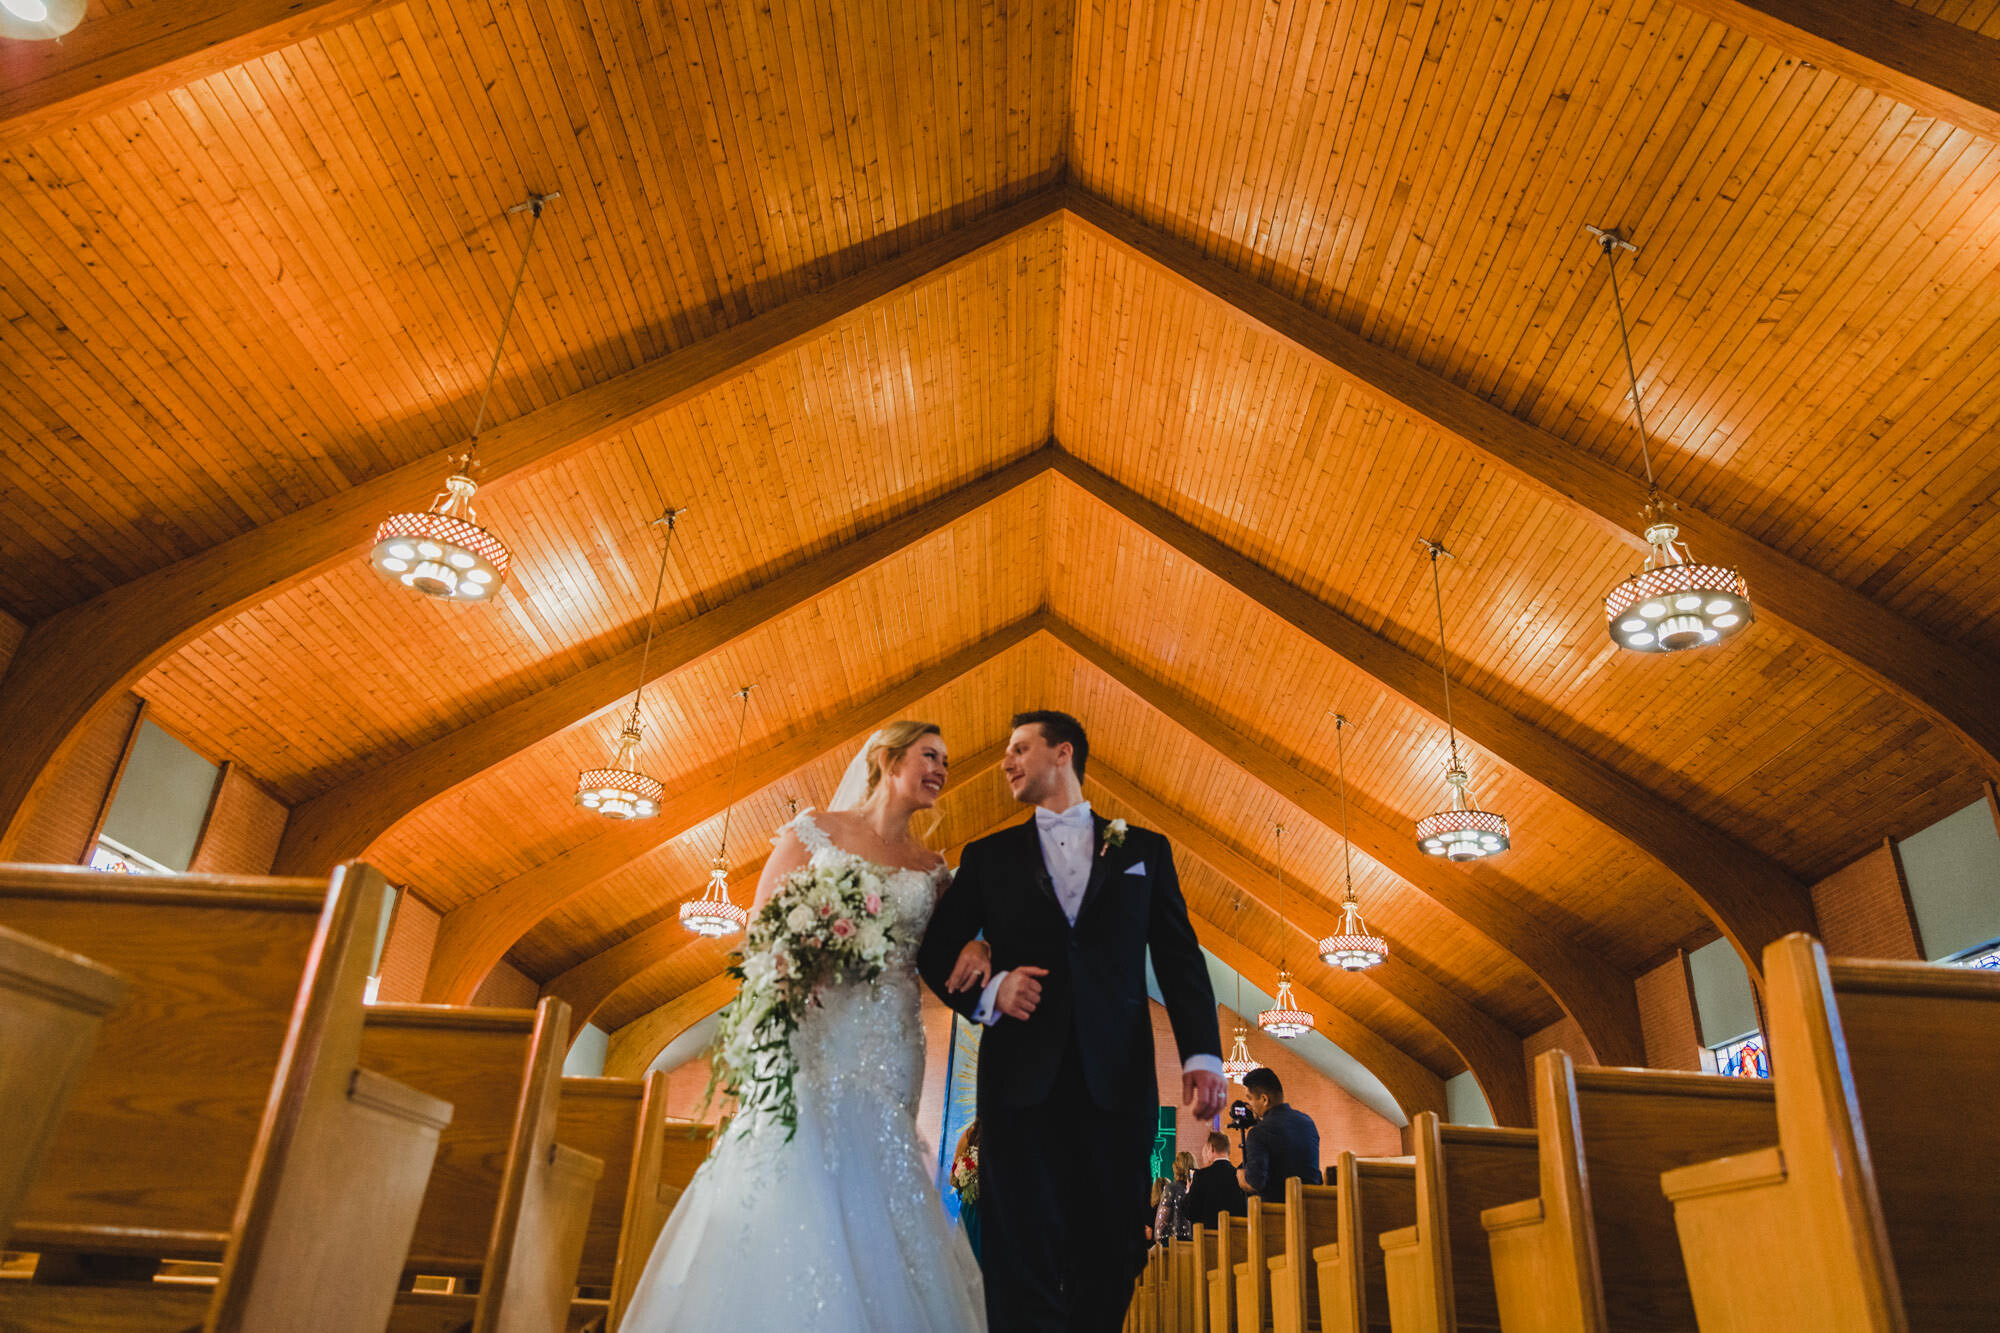 Christina & Dan Wedding at Huntingdon Valley Country Club 00013.JPG